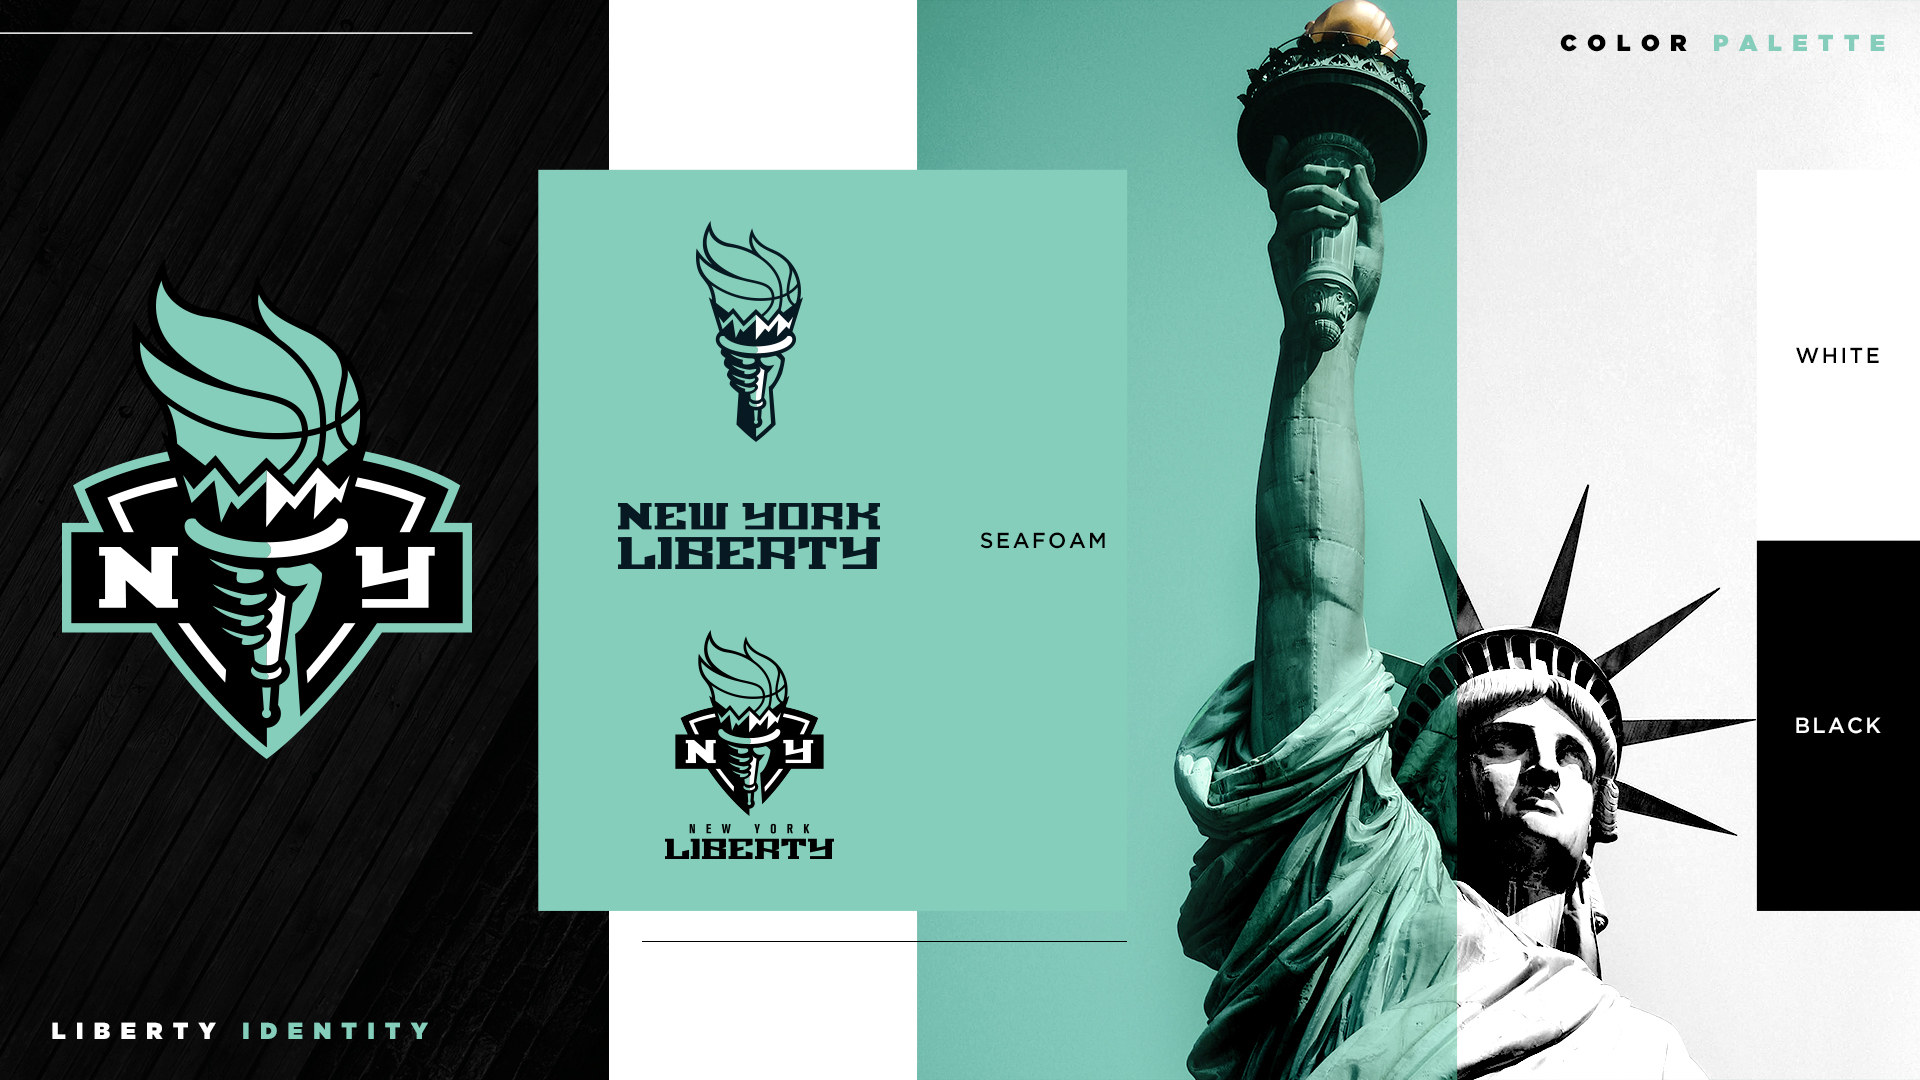 New York Liberty: Un nuevo comienzo